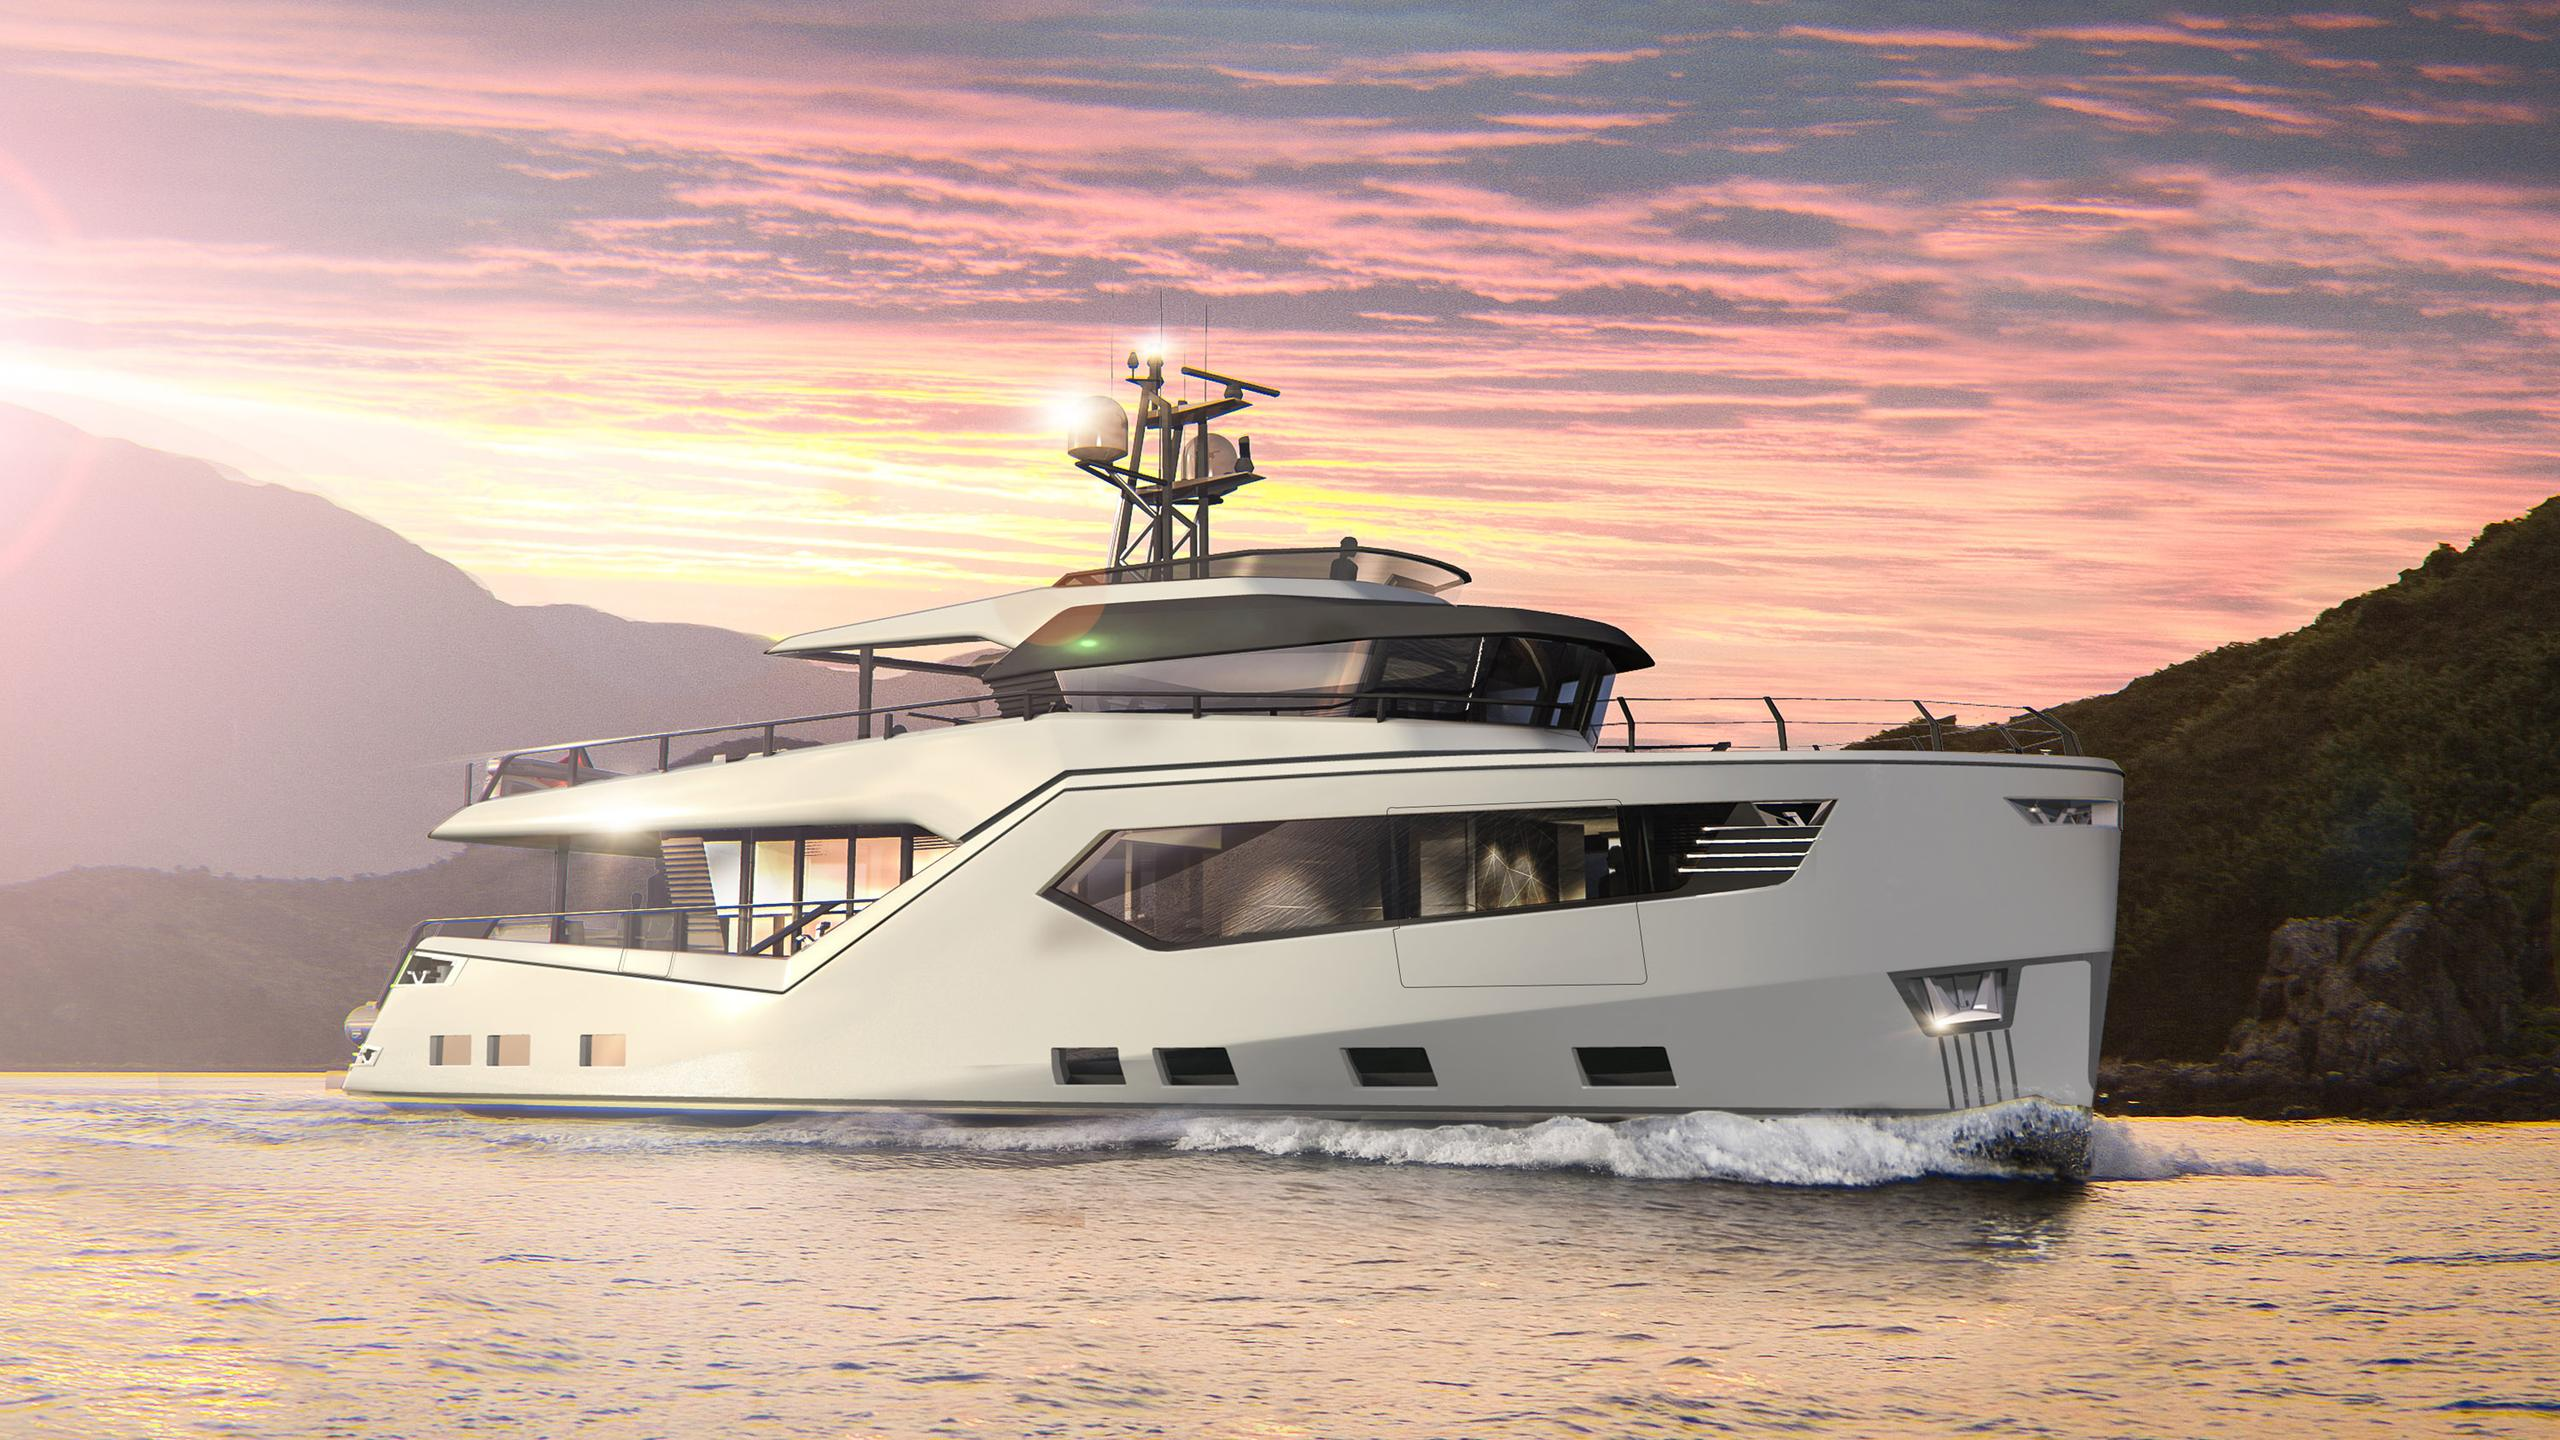 rock motoryacht evadne yachts 24m 2018 rendering half profile